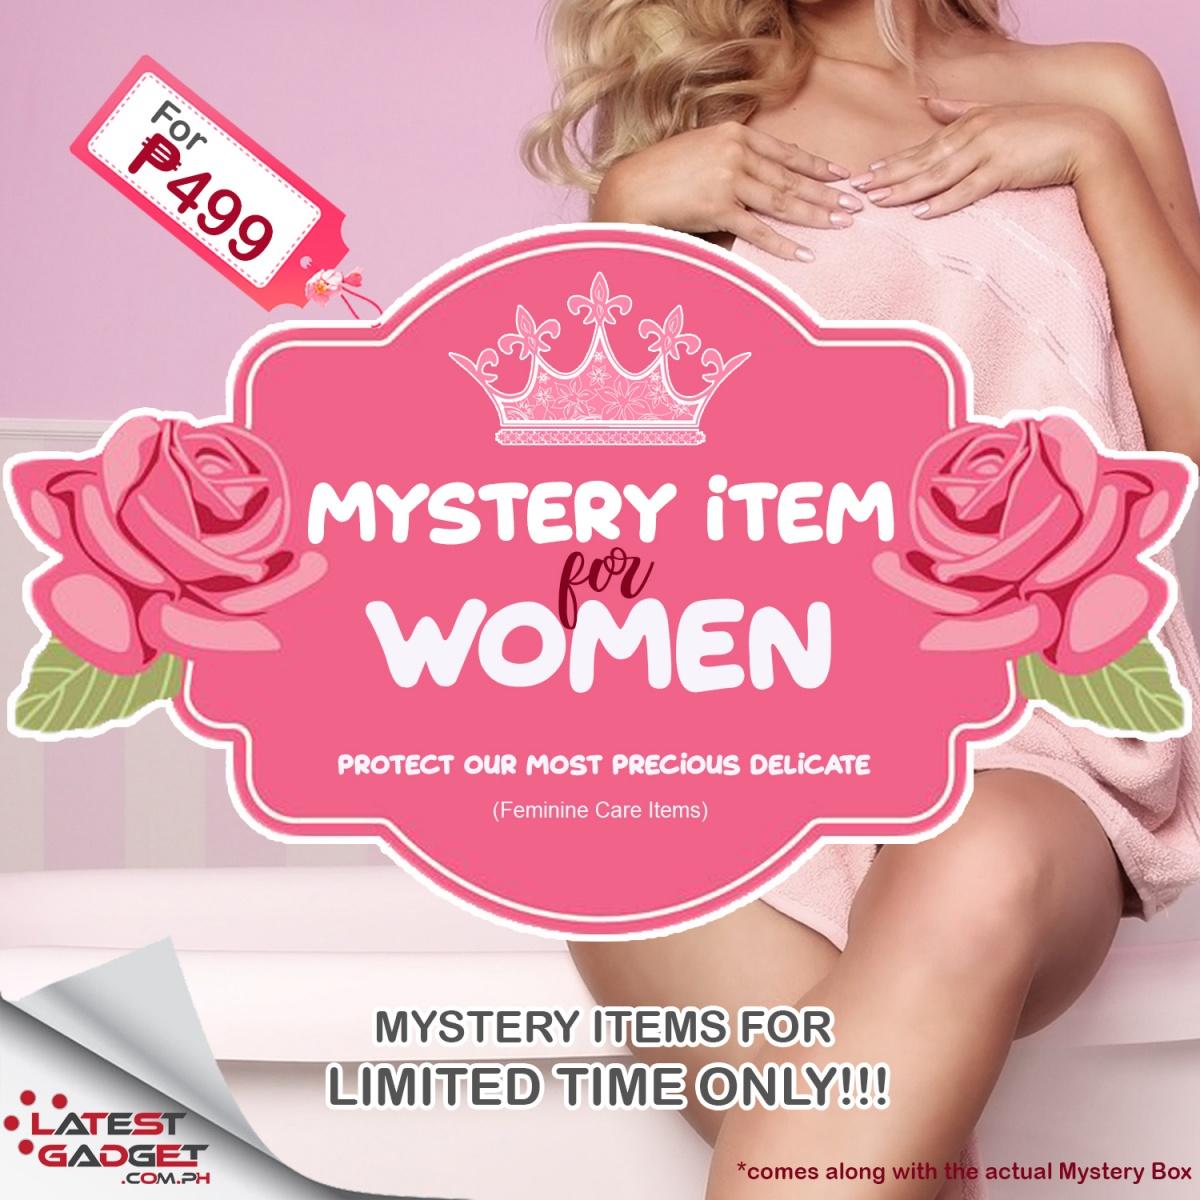 MYSTERY ITEM - FEMININE CARE